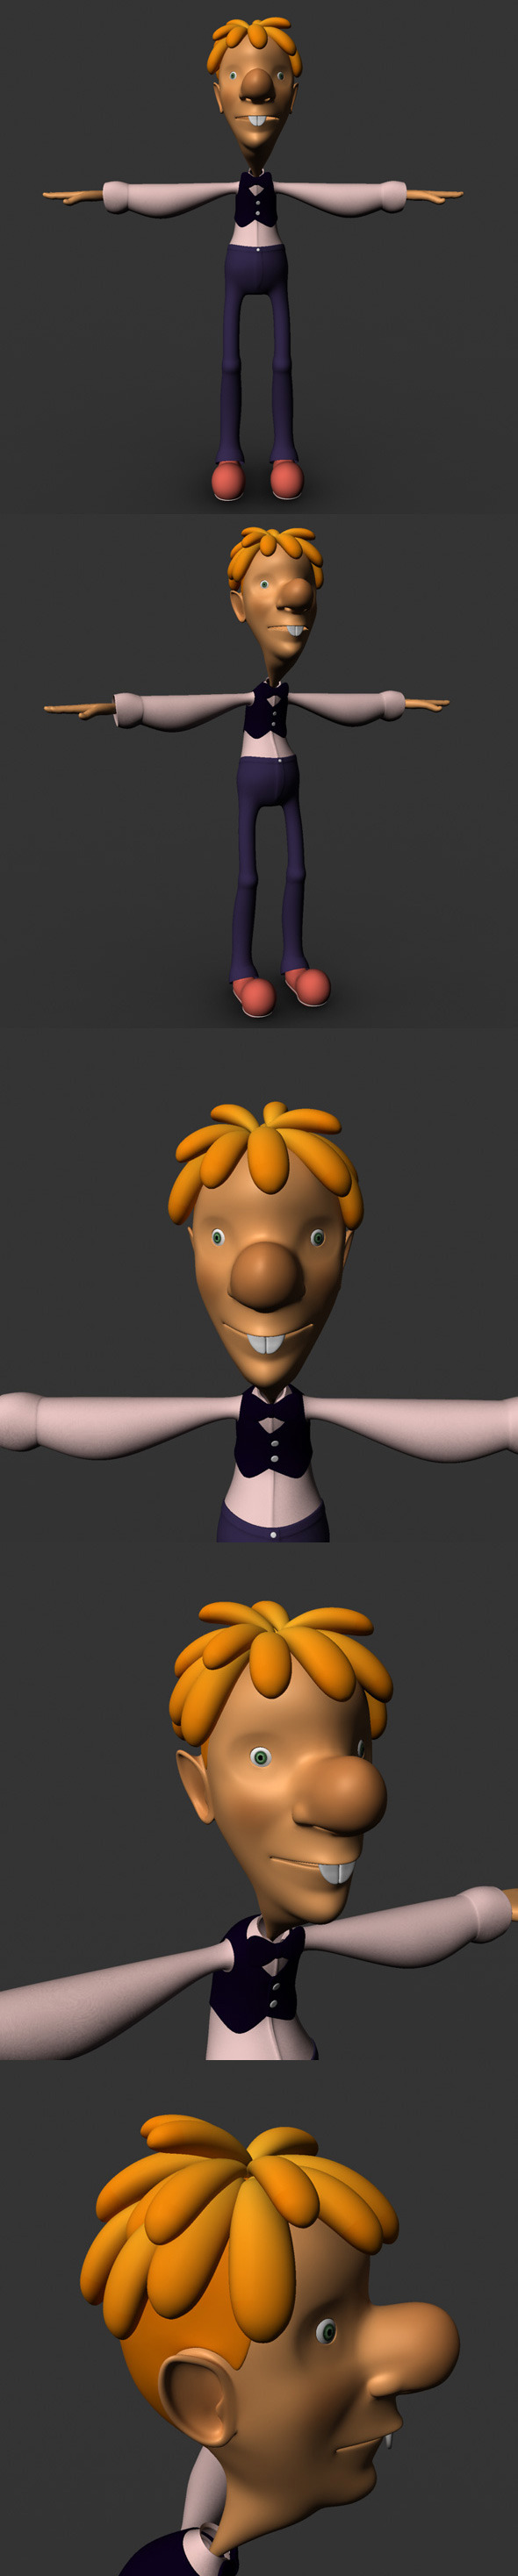 Cartoon Character Model - 3DOcean Item for Sale